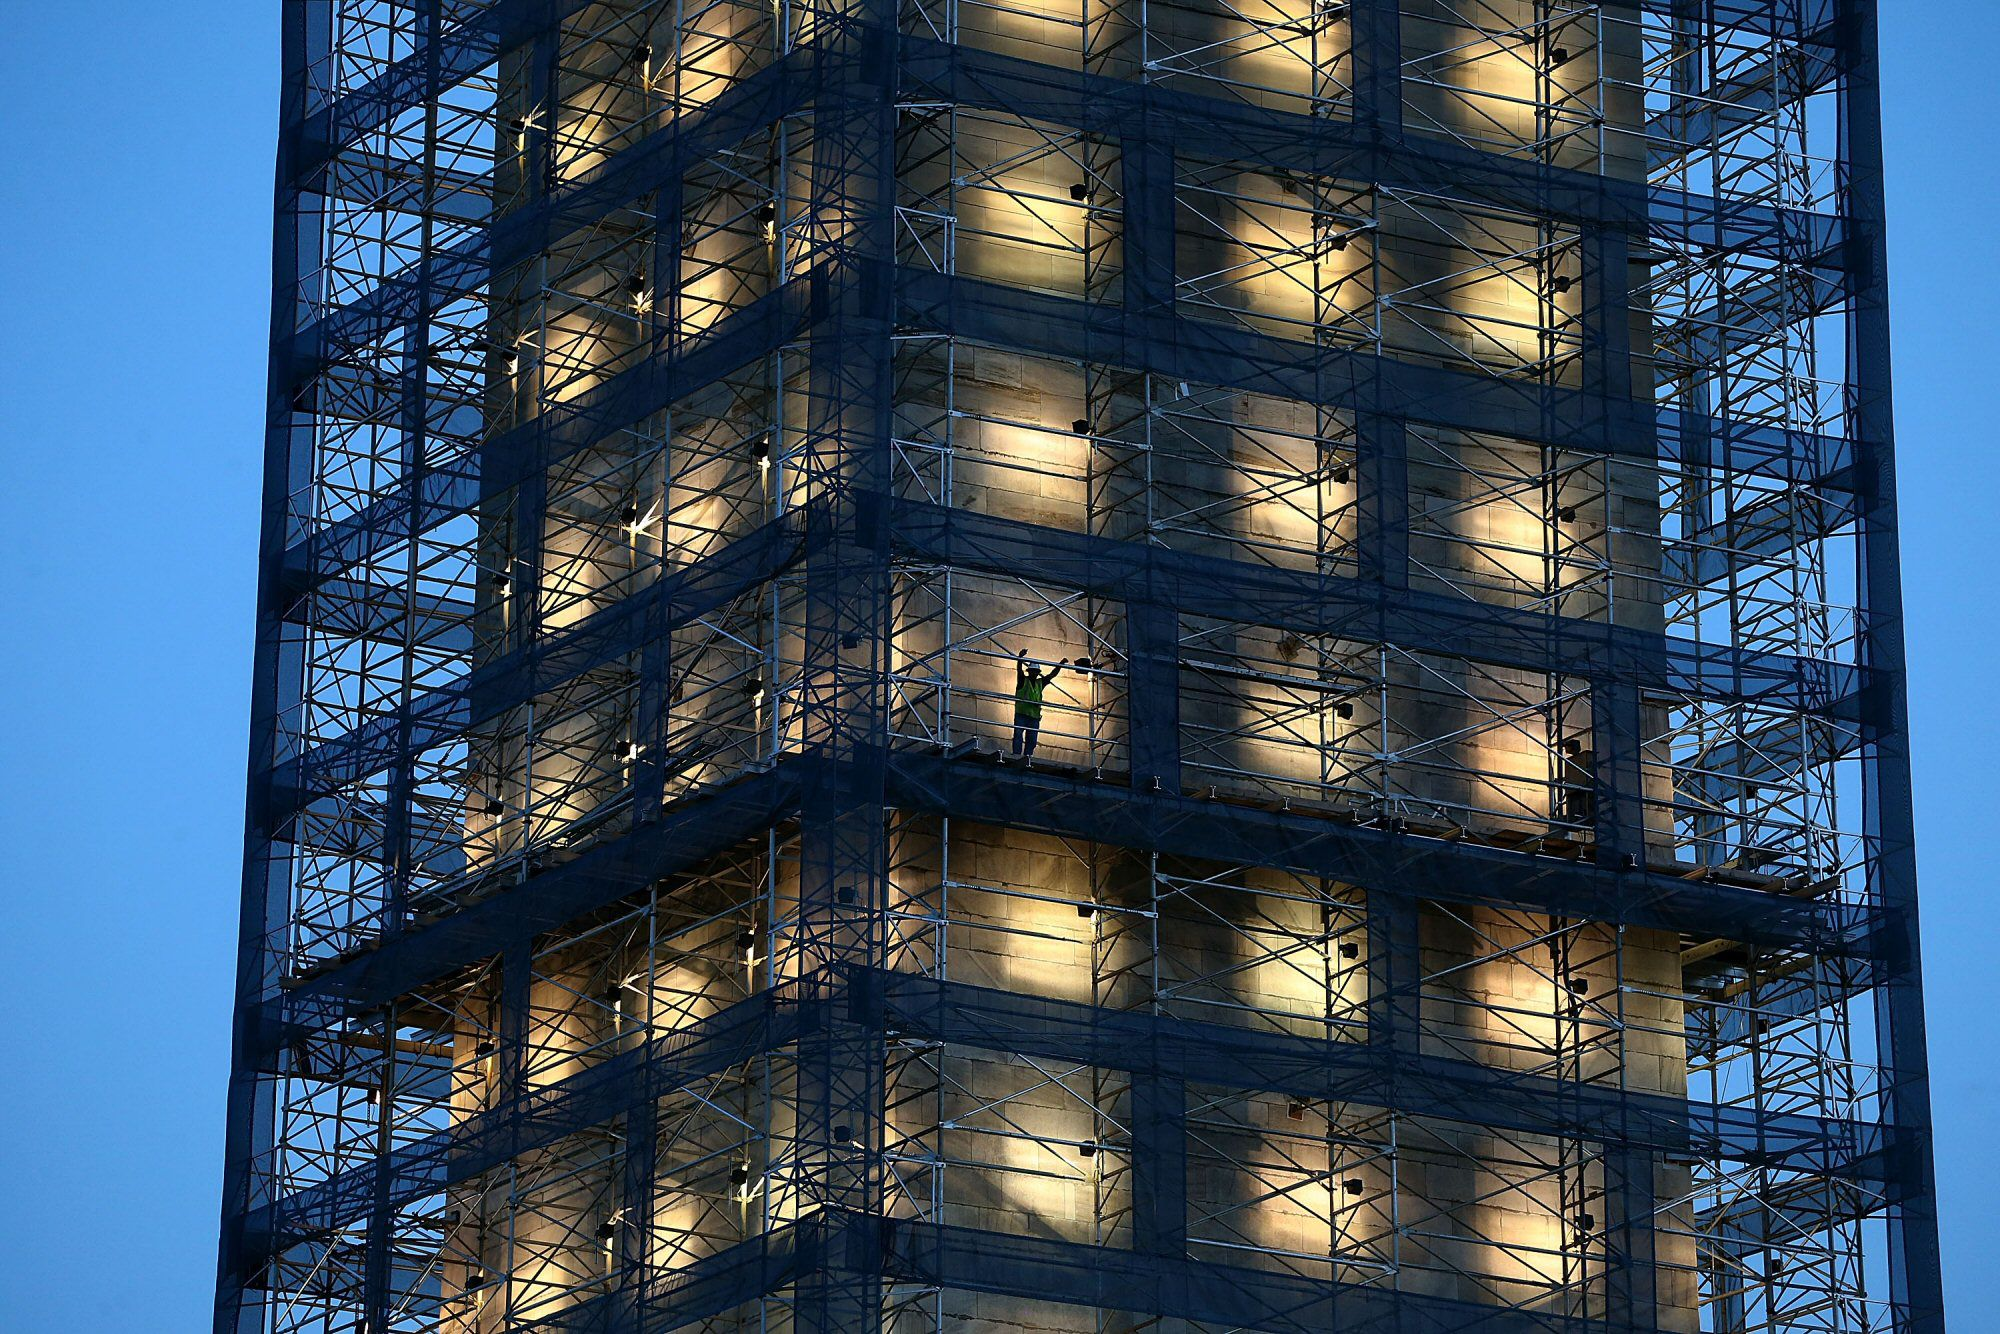 Worker on Washington Monument scaffolding, illumination designed by Michael Graves, July 8, 2013